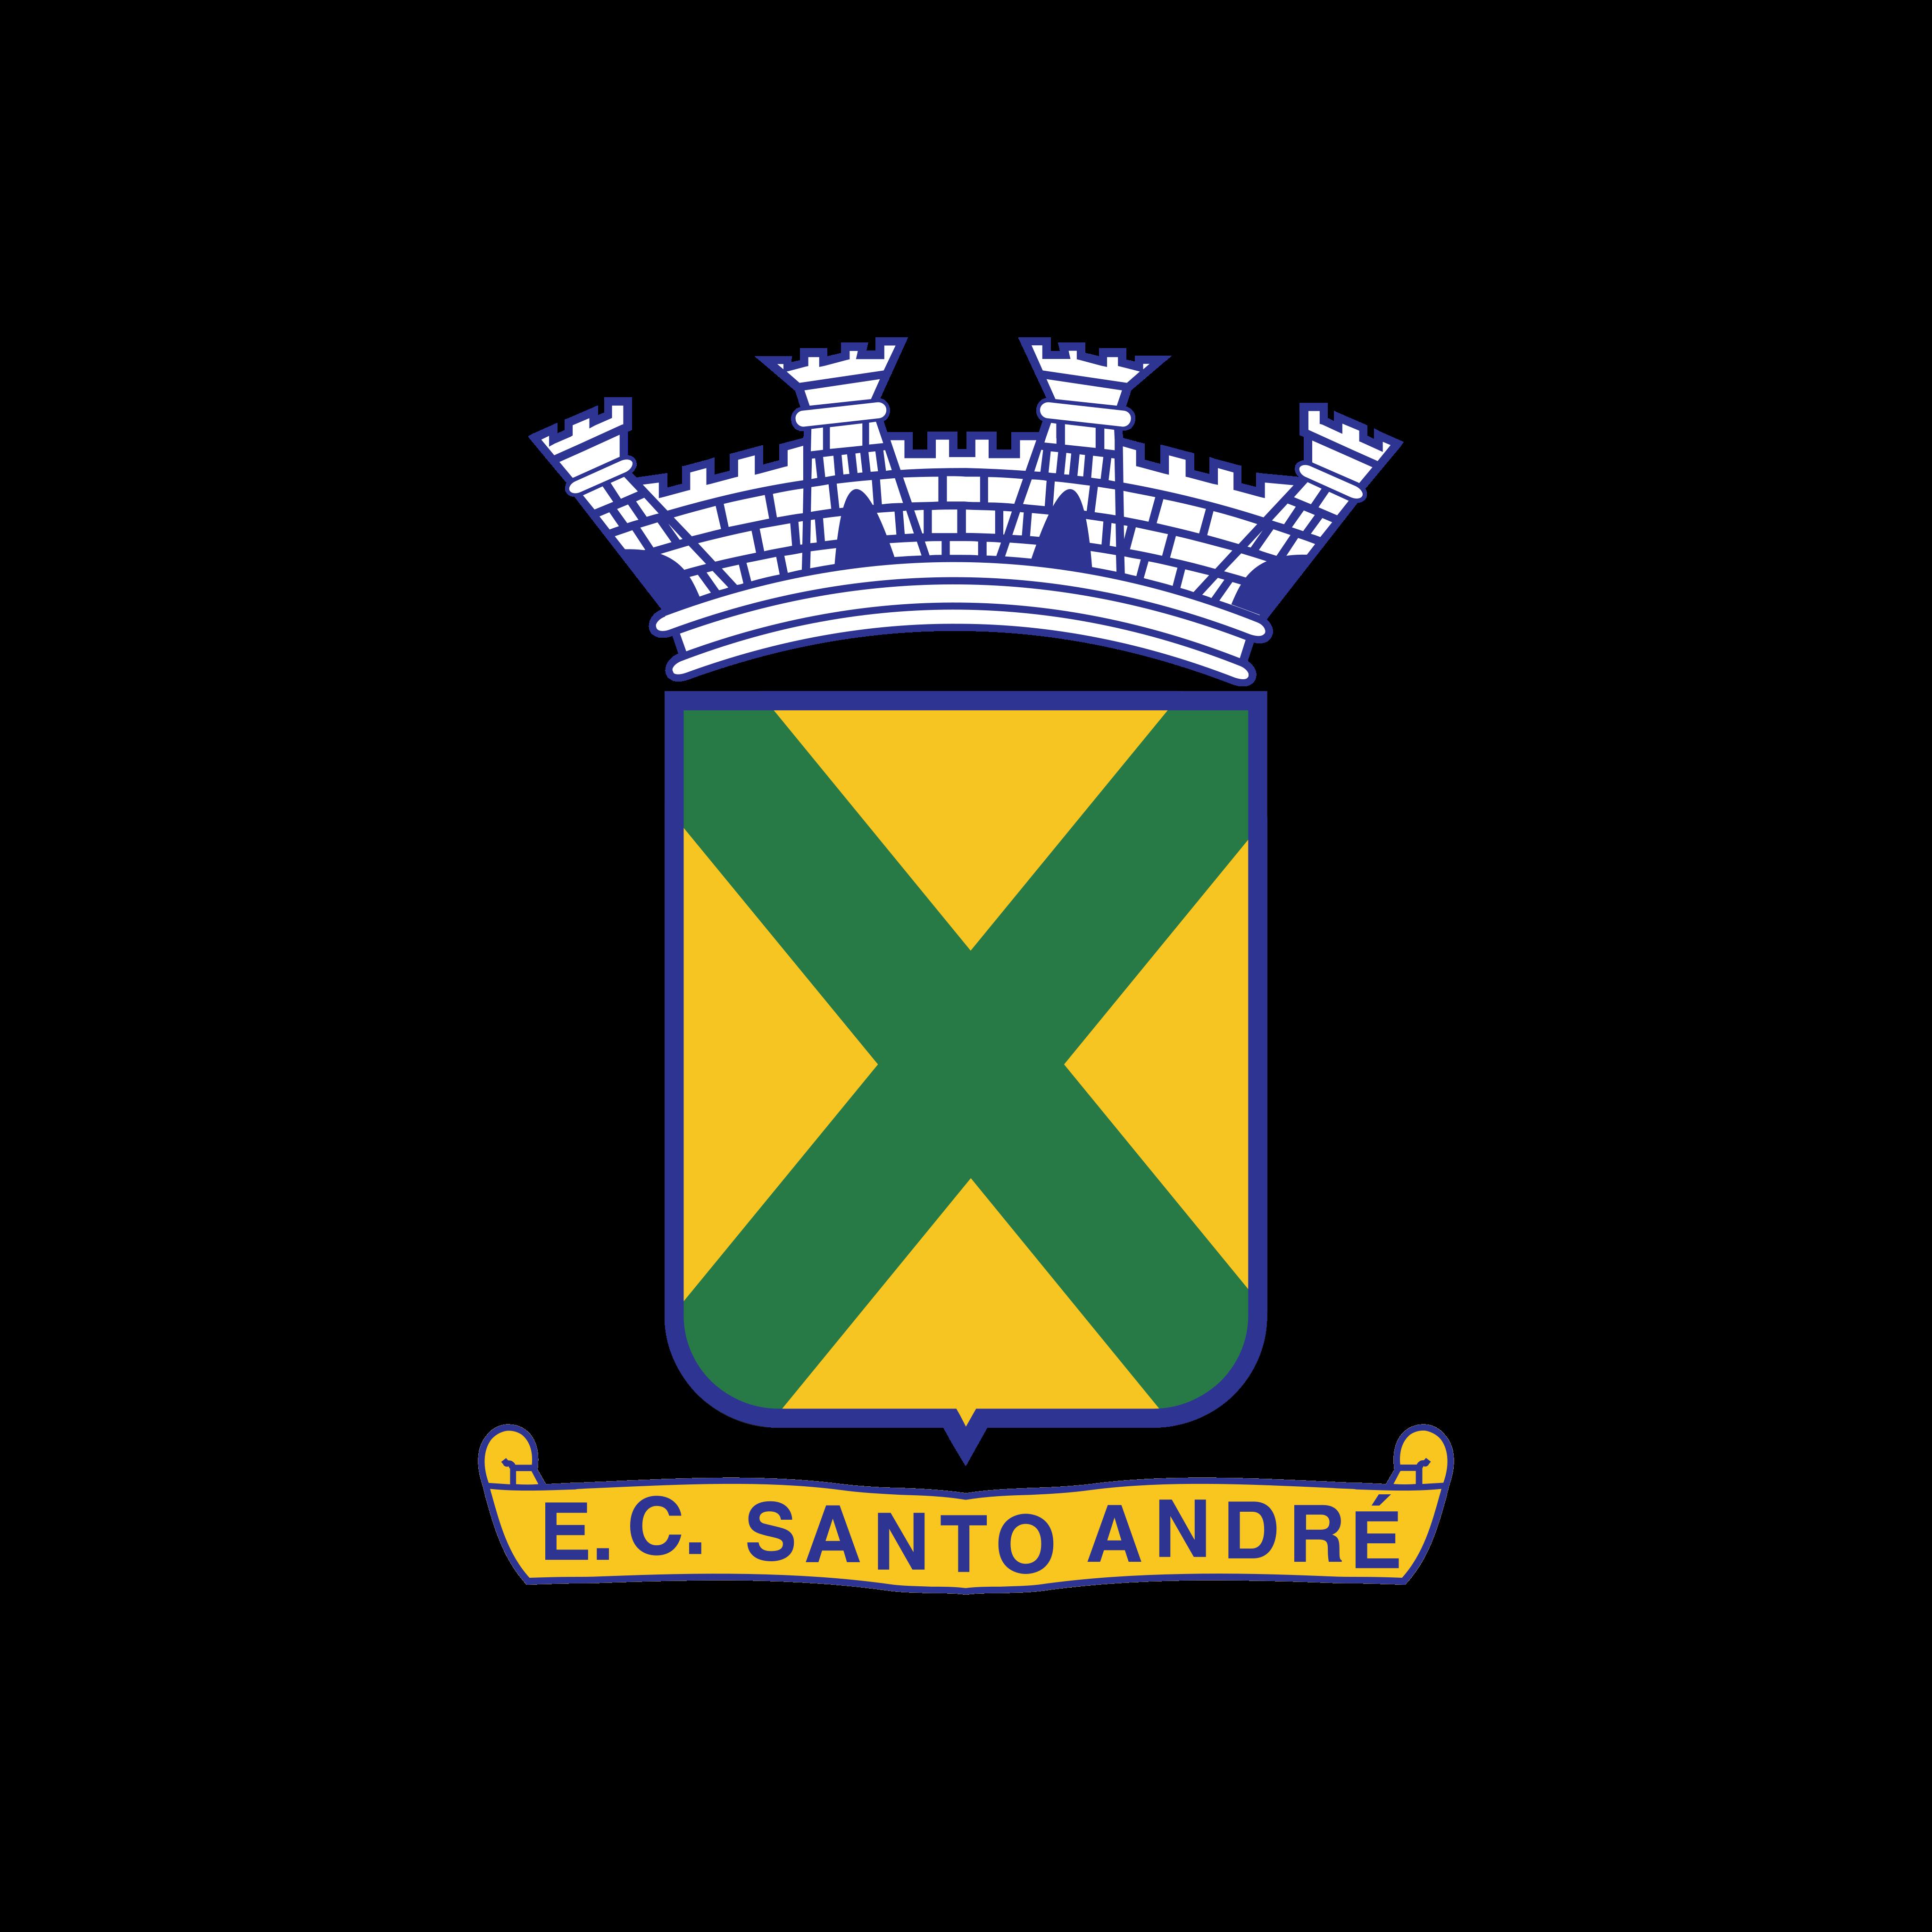 ec santo andre logo 0 - EC Santo André Logo